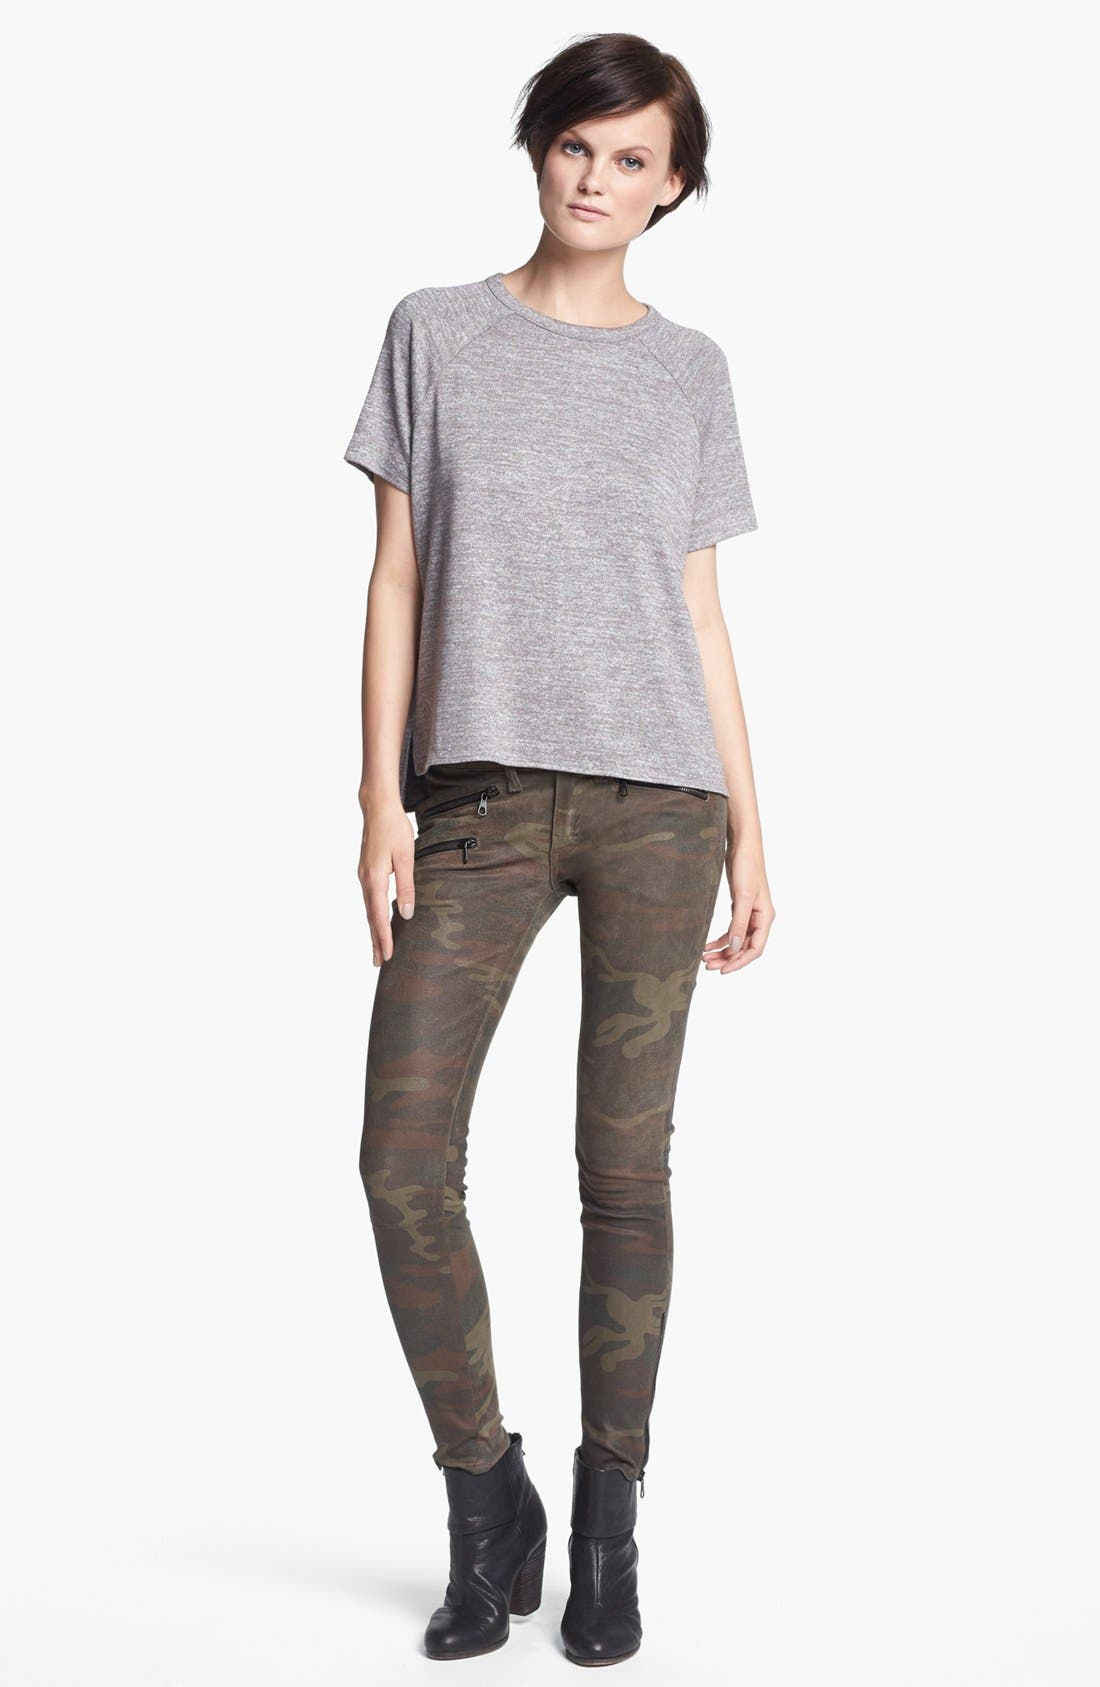 Main Image - rag & bone/JEAN 'Camden' Short Sleeve Tee